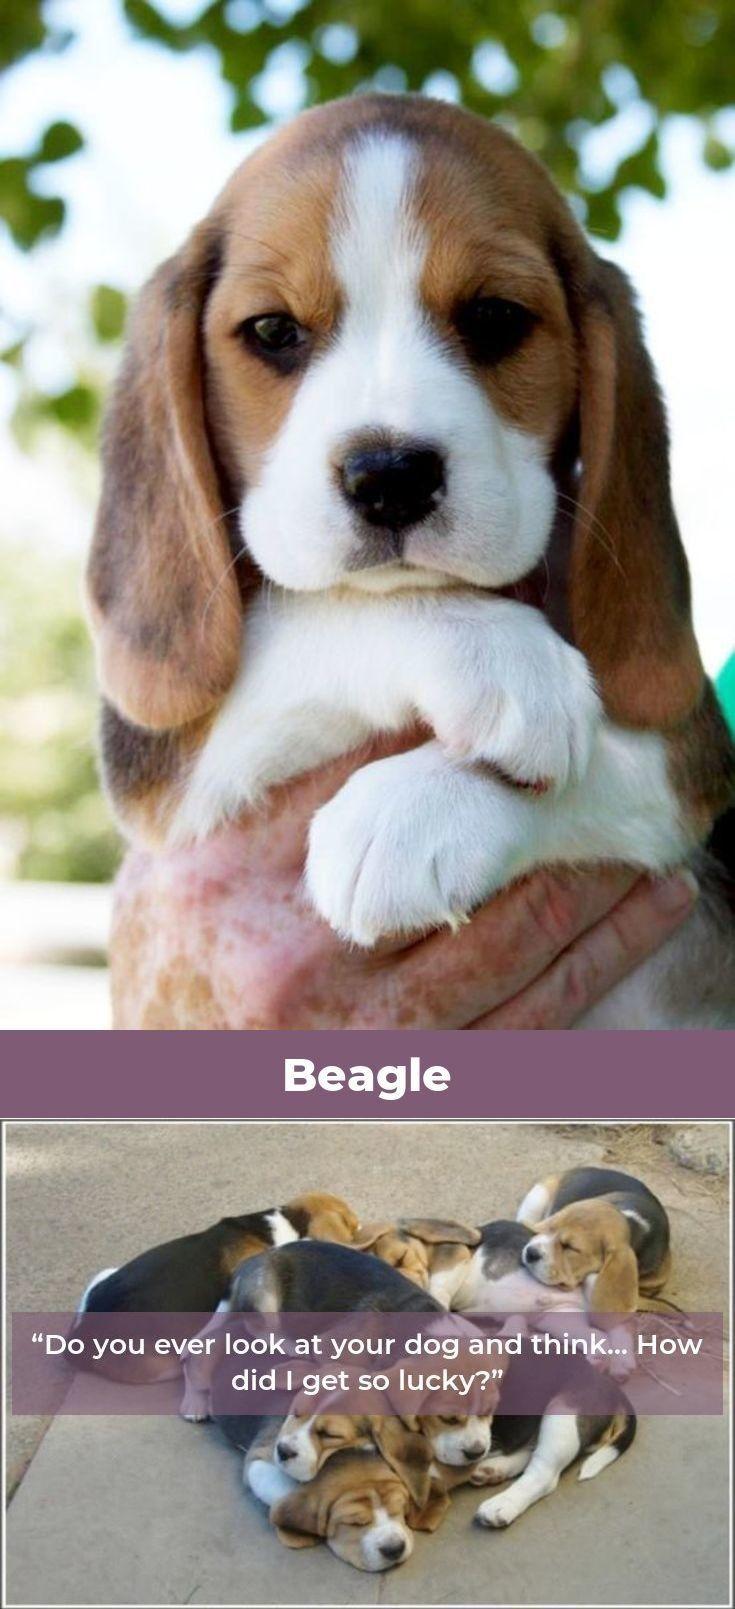 Beagle Puppy Beagle Beagles Memes Dog Breeds Beagle Bulldog Breeds